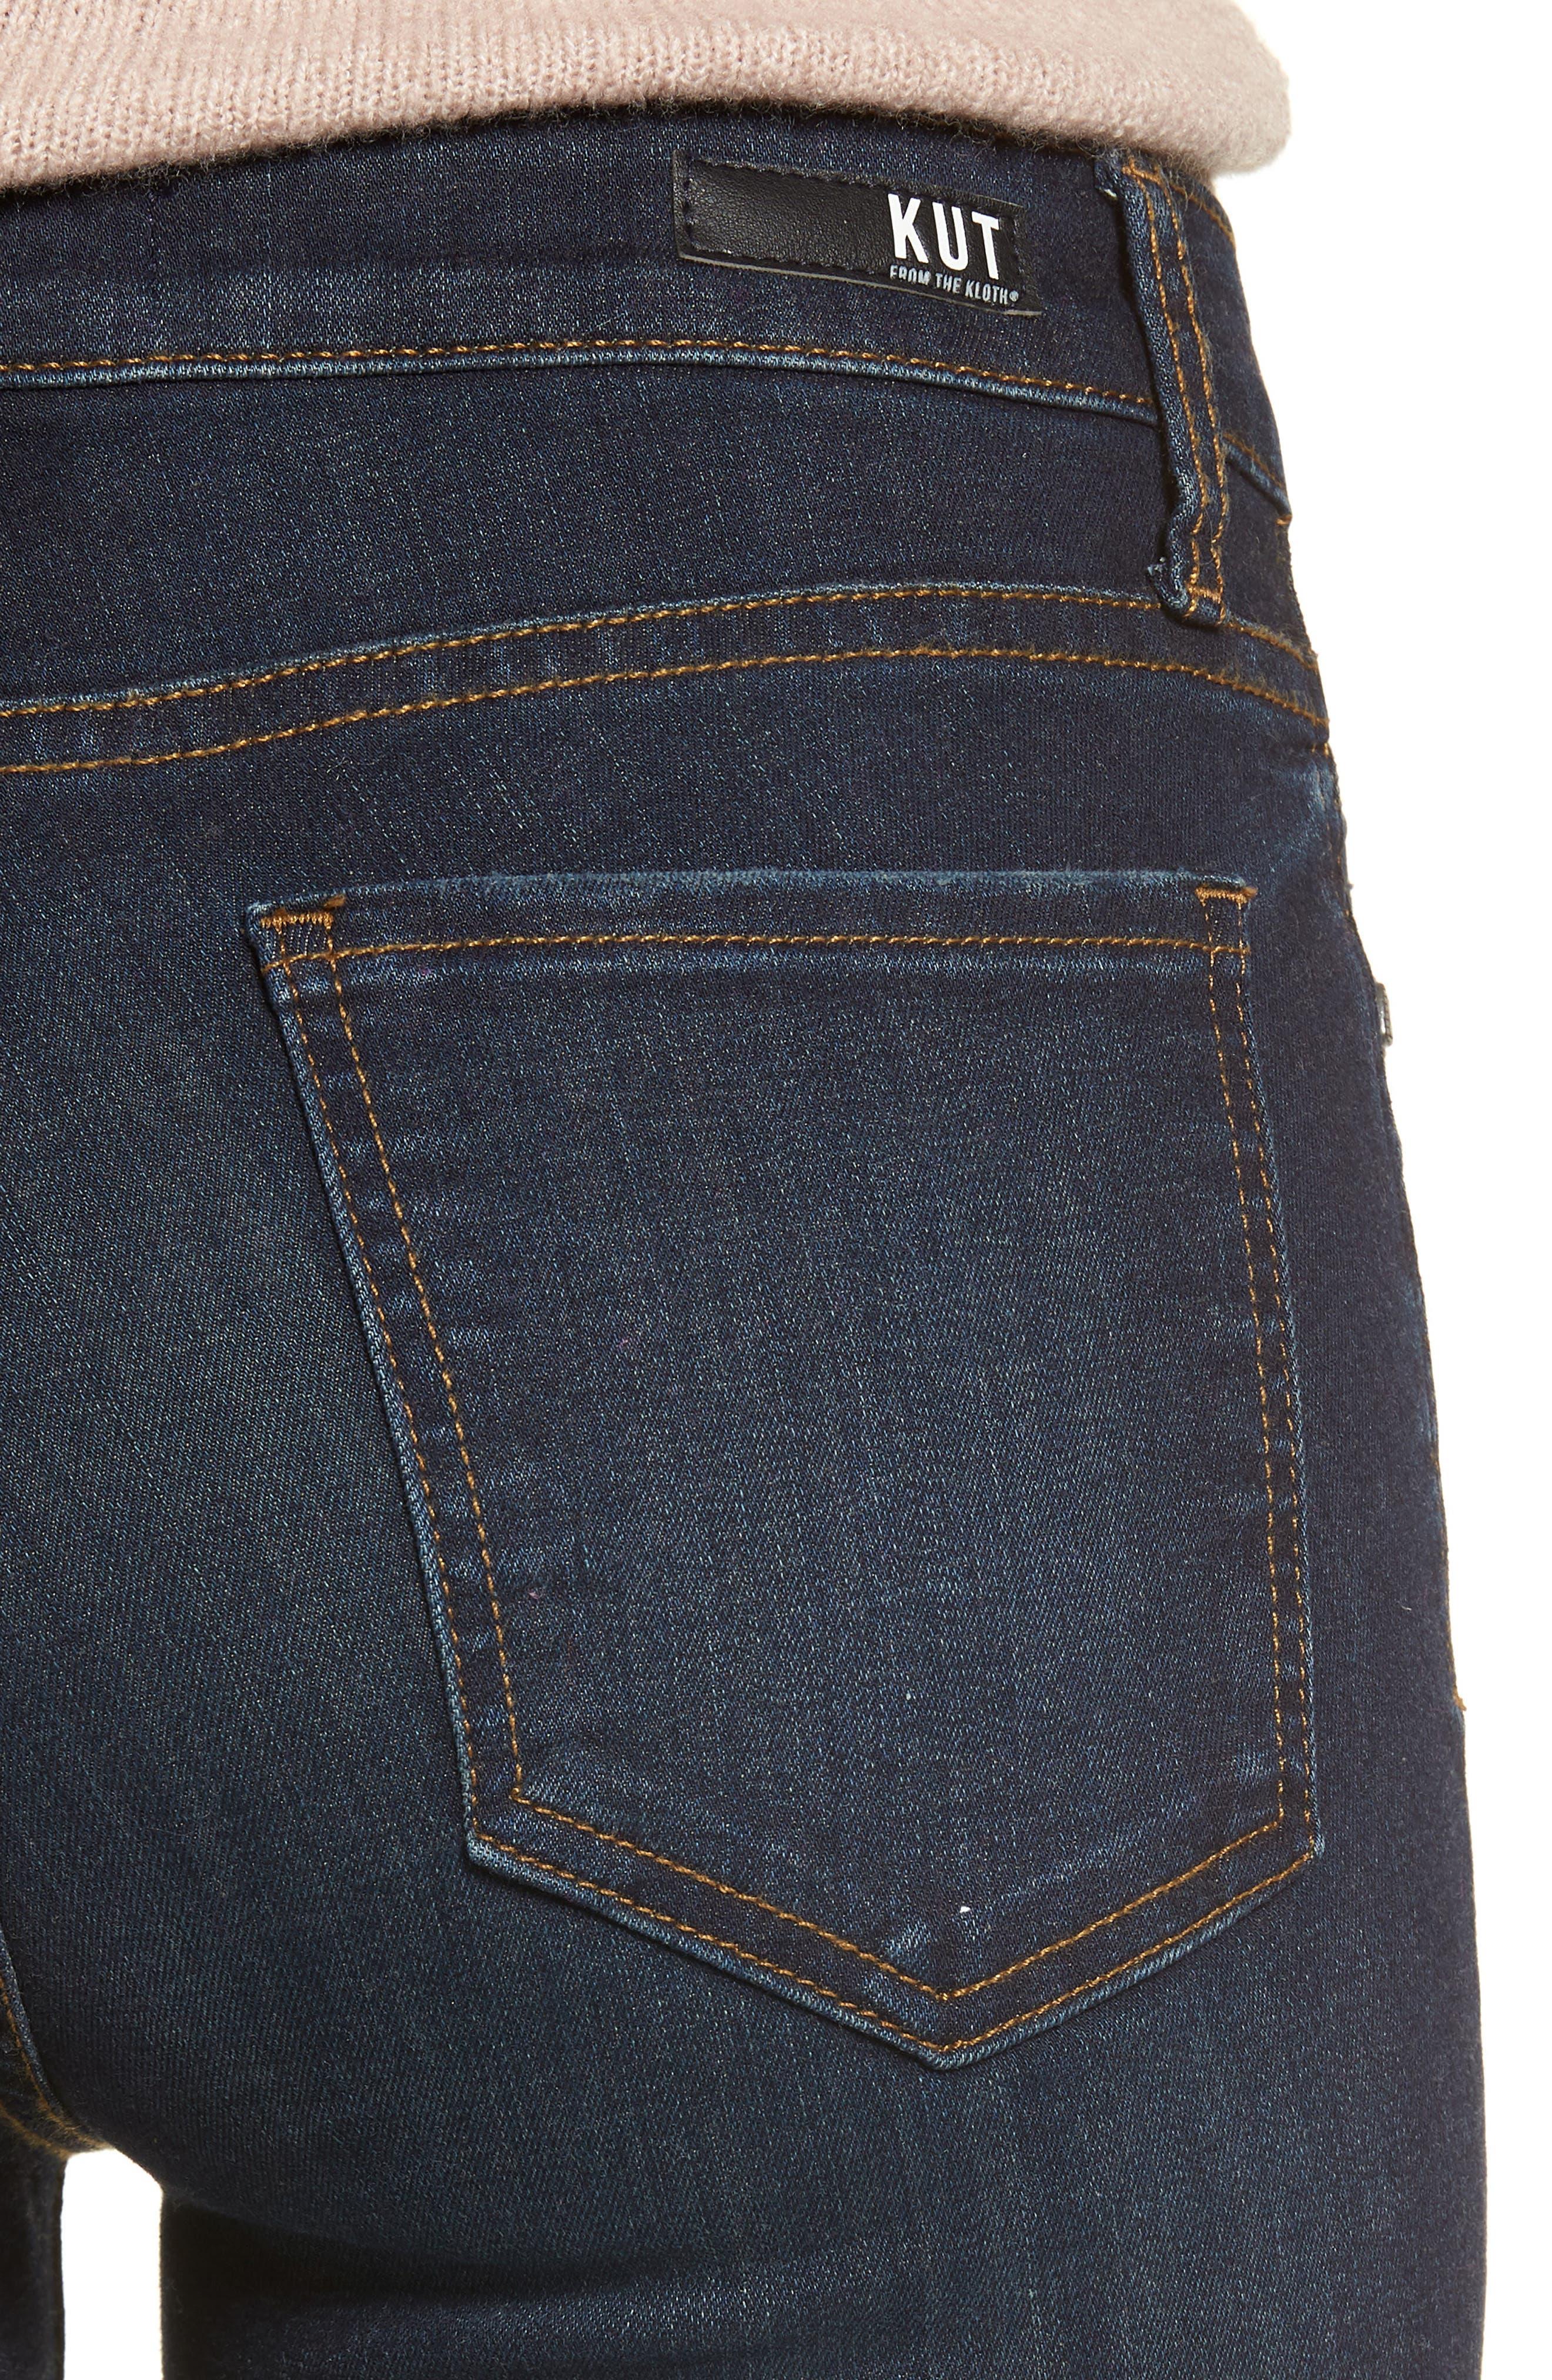 Diana Skinny Jeans,                             Alternate thumbnail 4, color,                             435